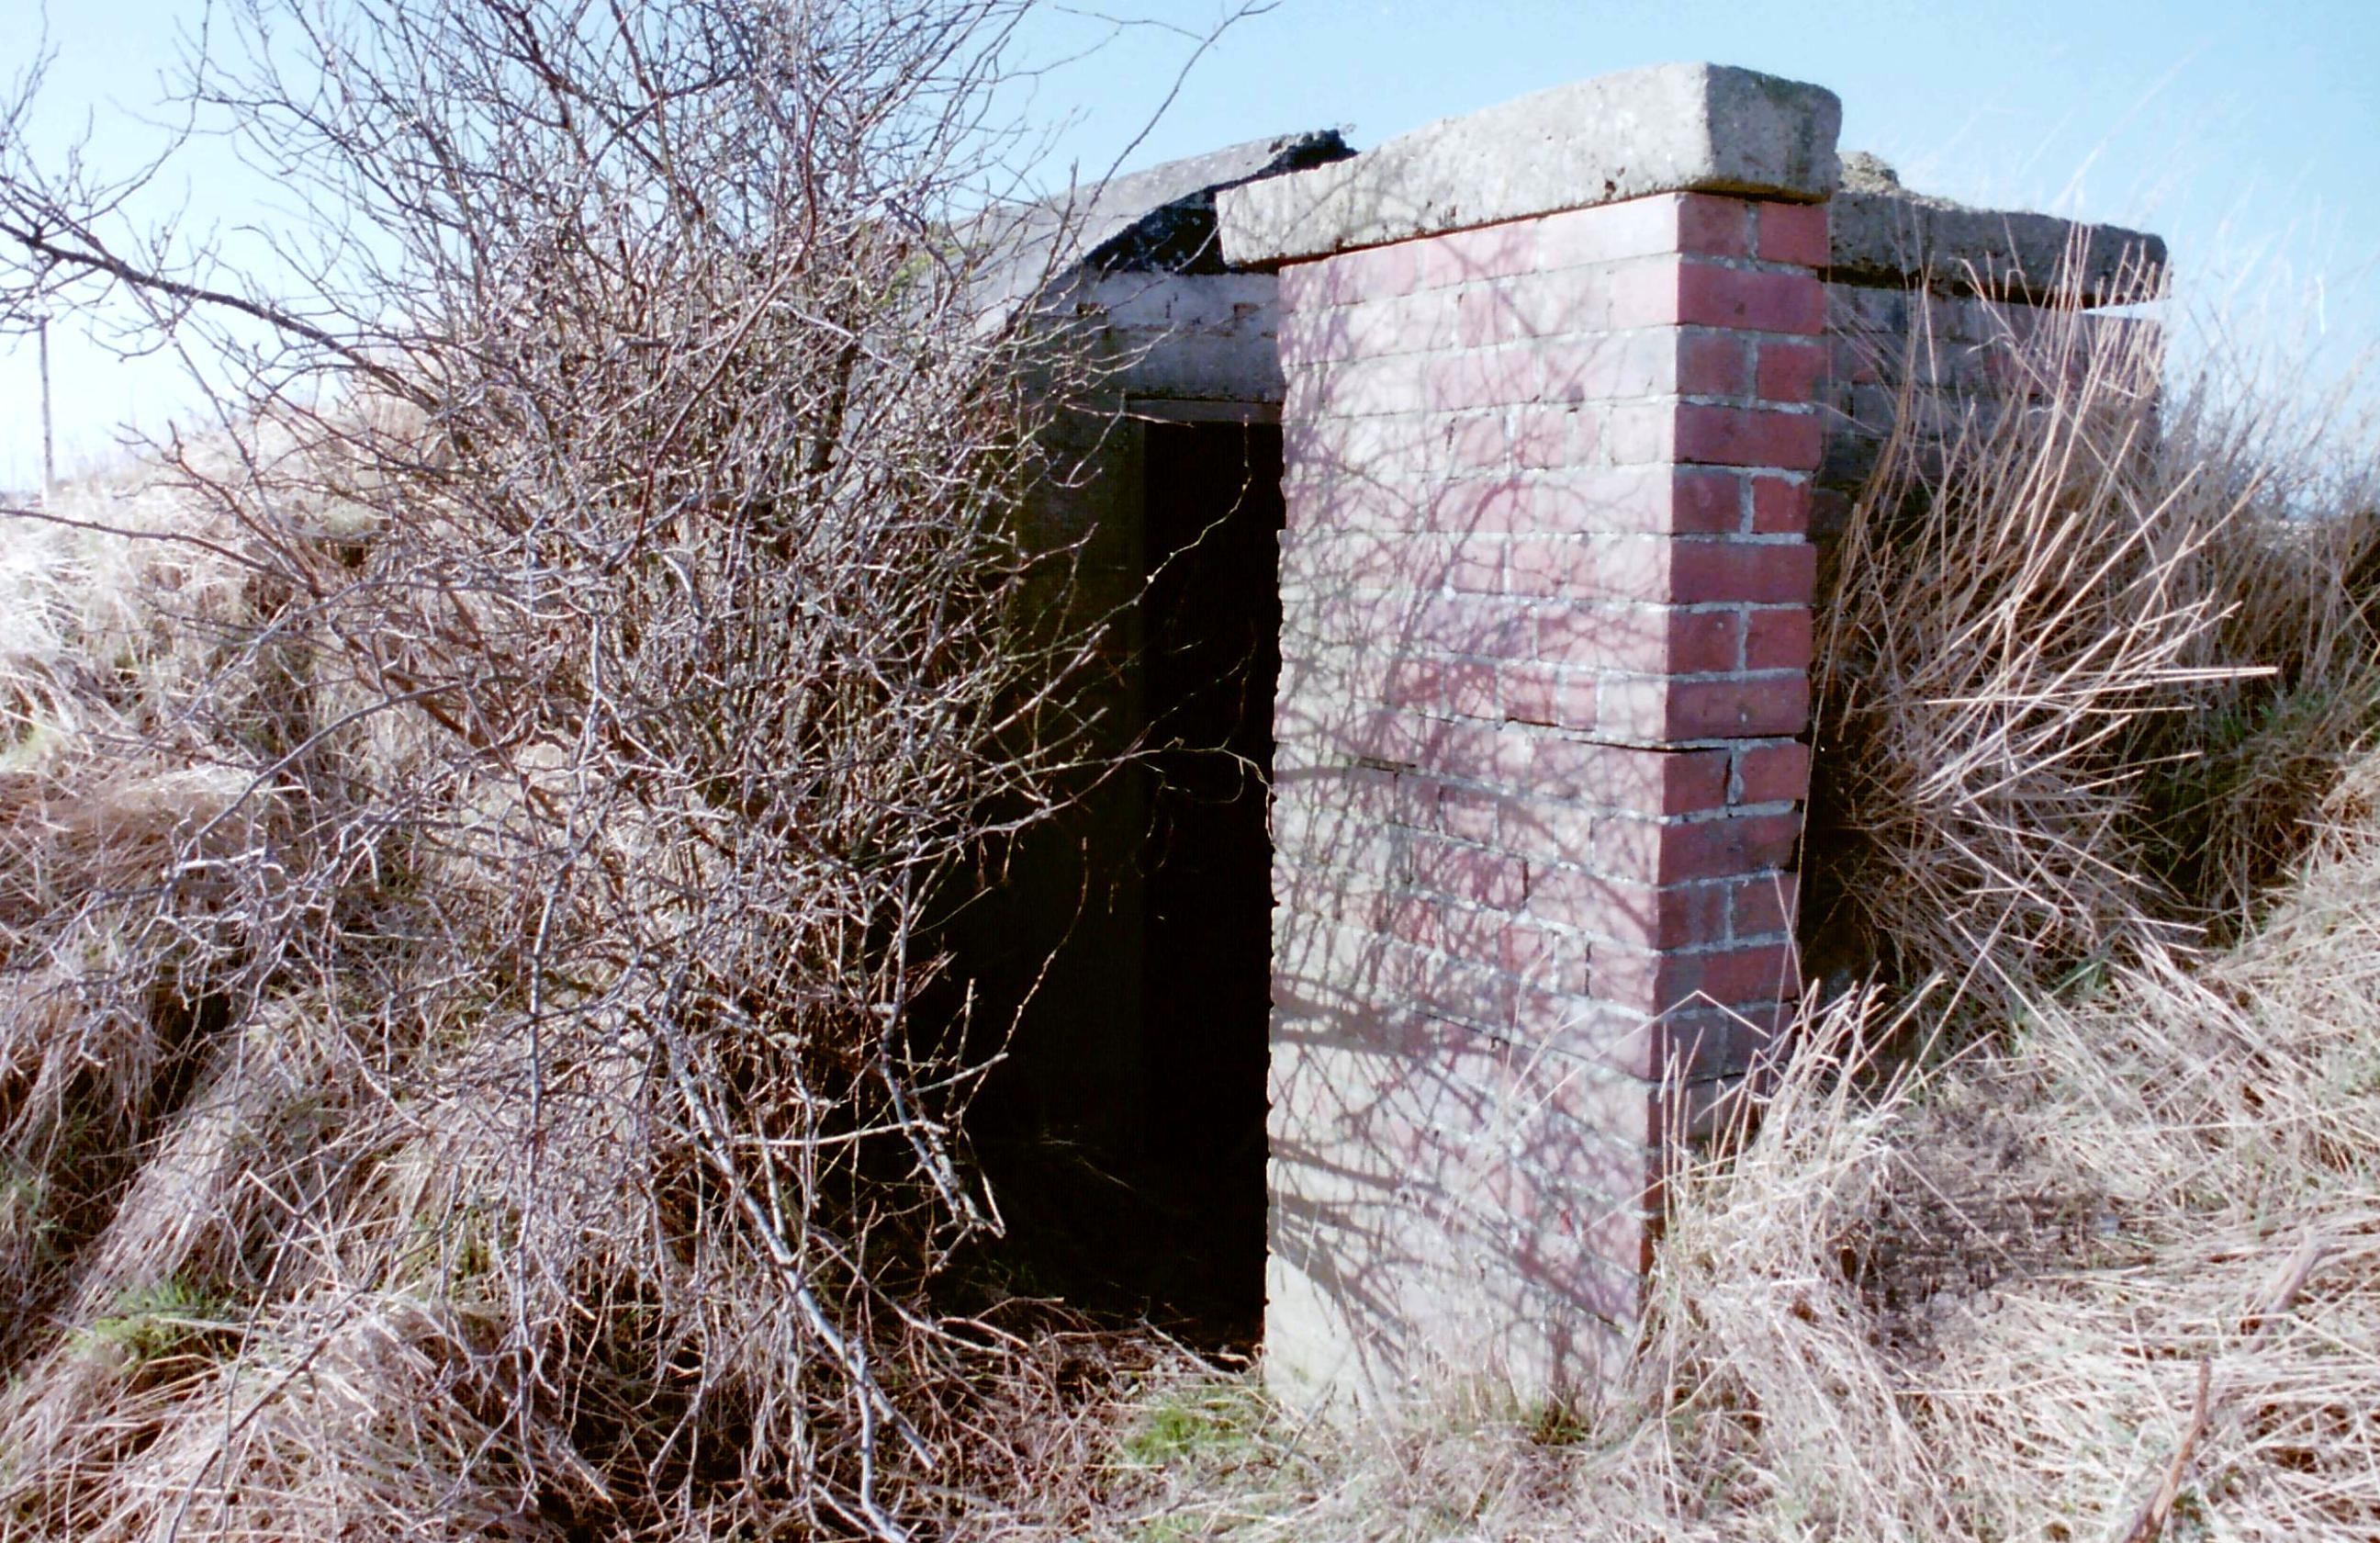 air-raid-shelter-teesdie-airport-2